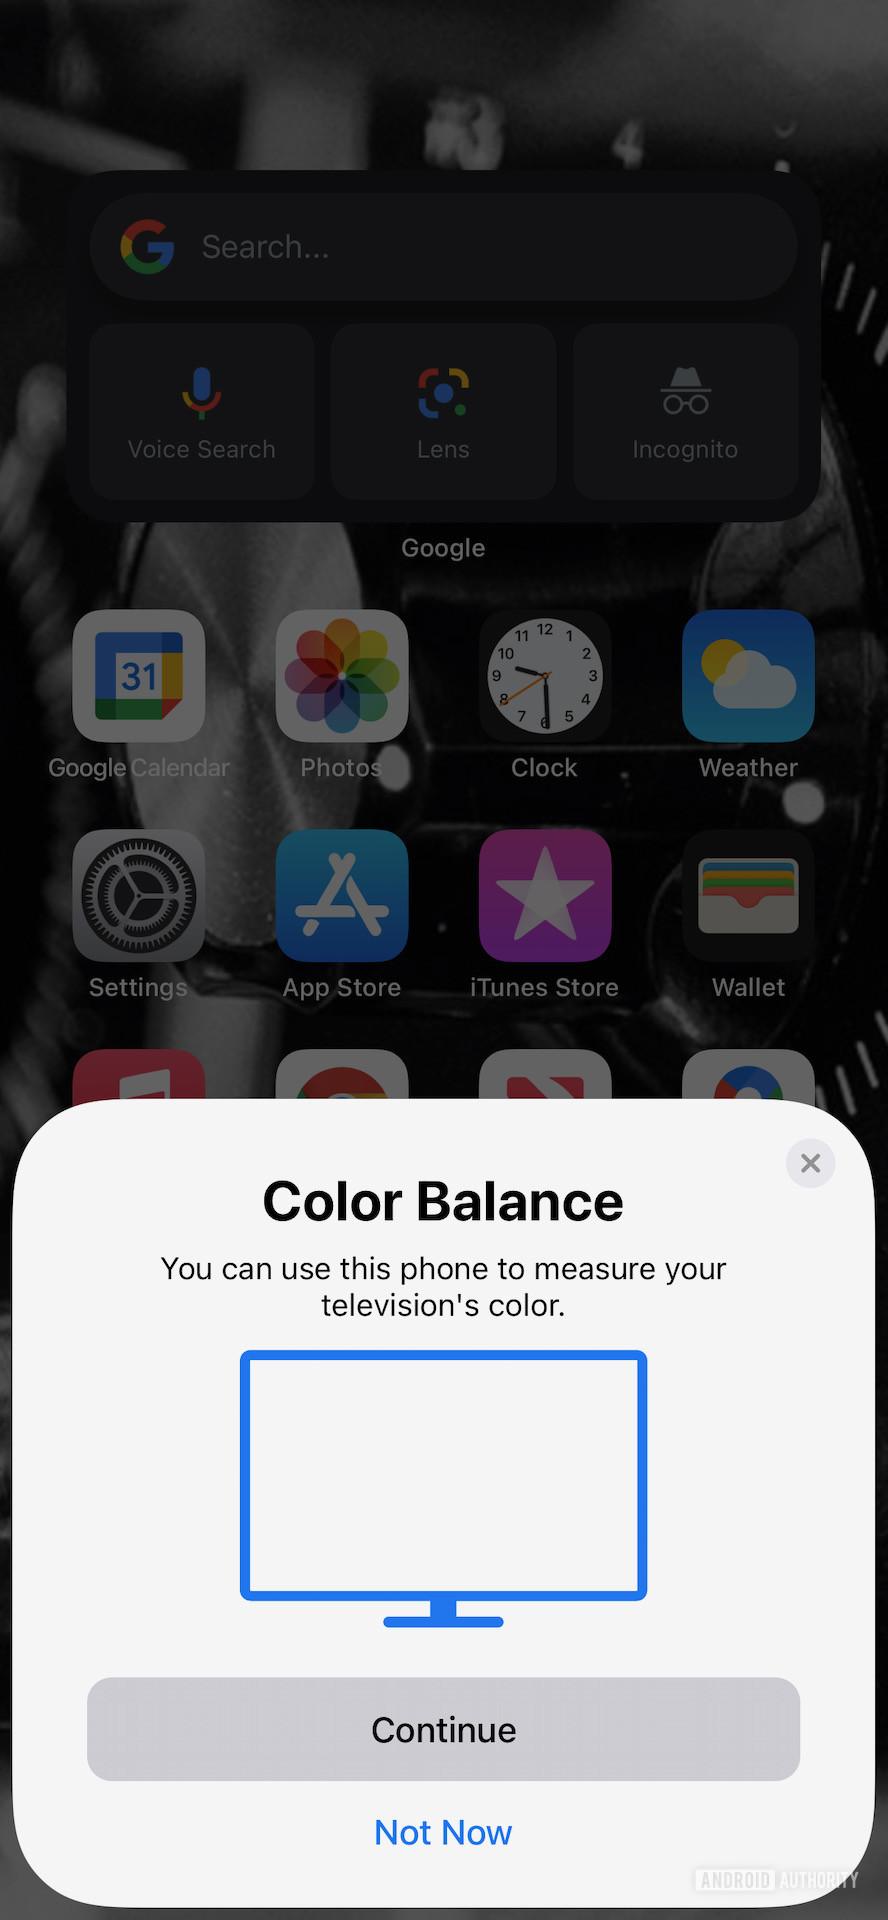 Apple TV 4K Color balance tool